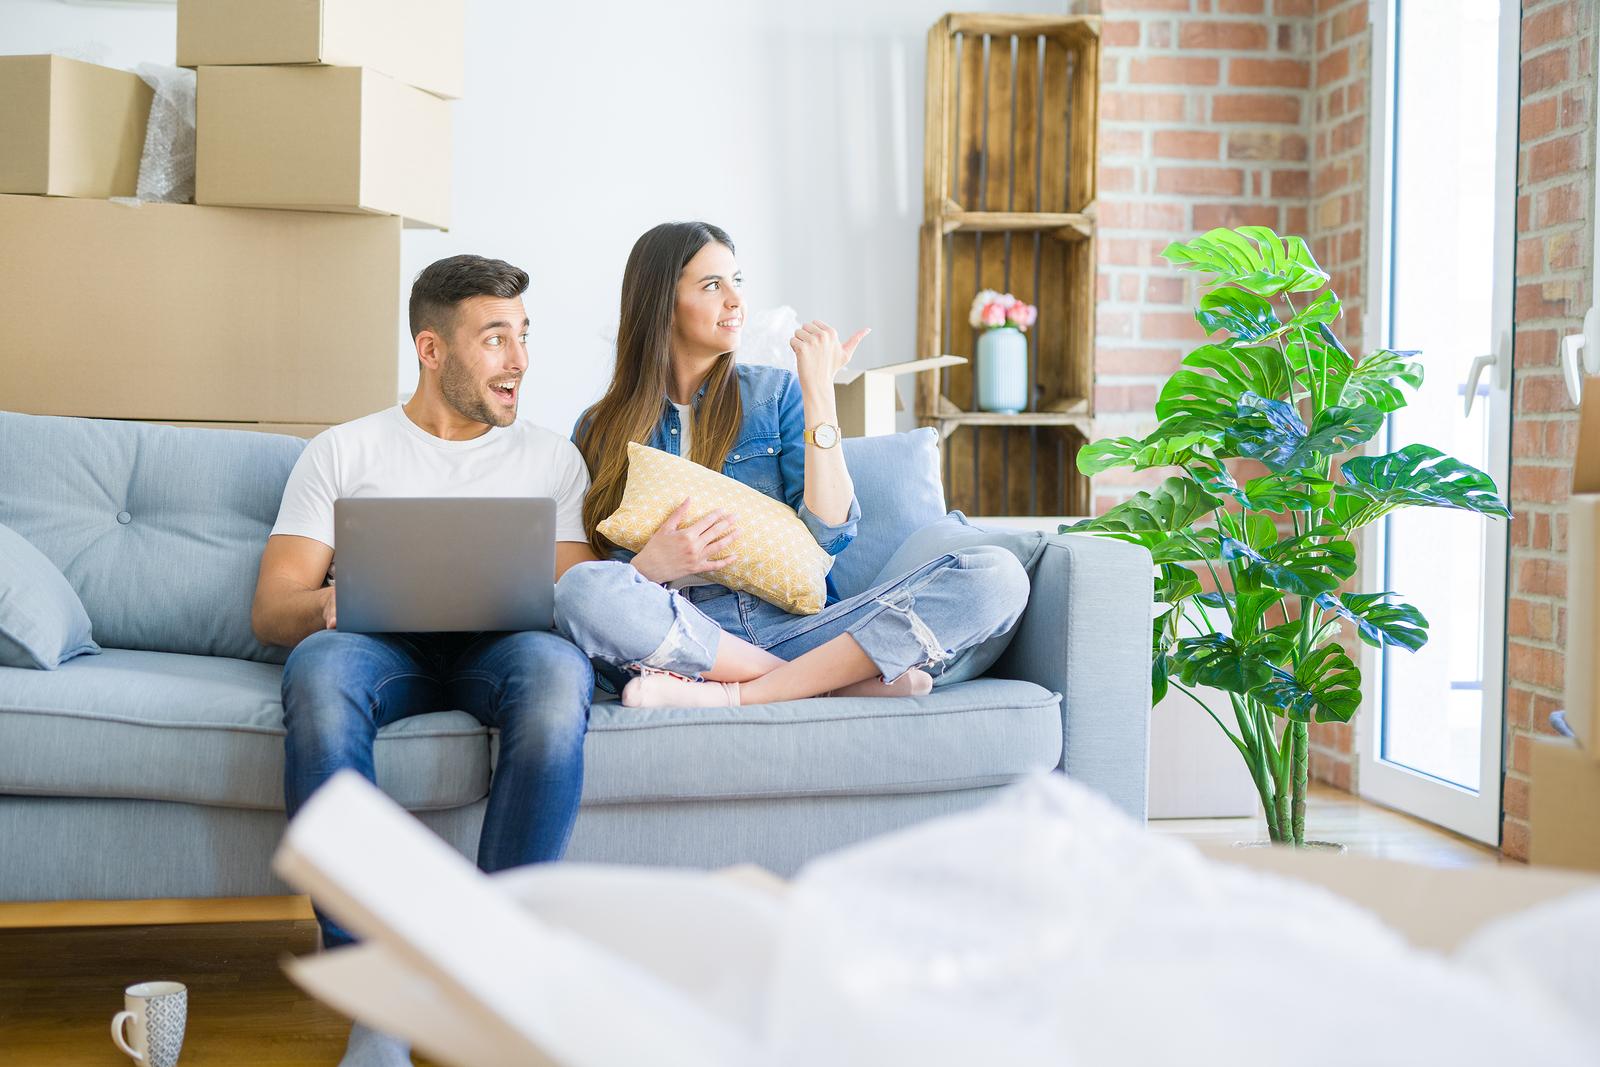 East Boca Raton Realtor reports on home sales